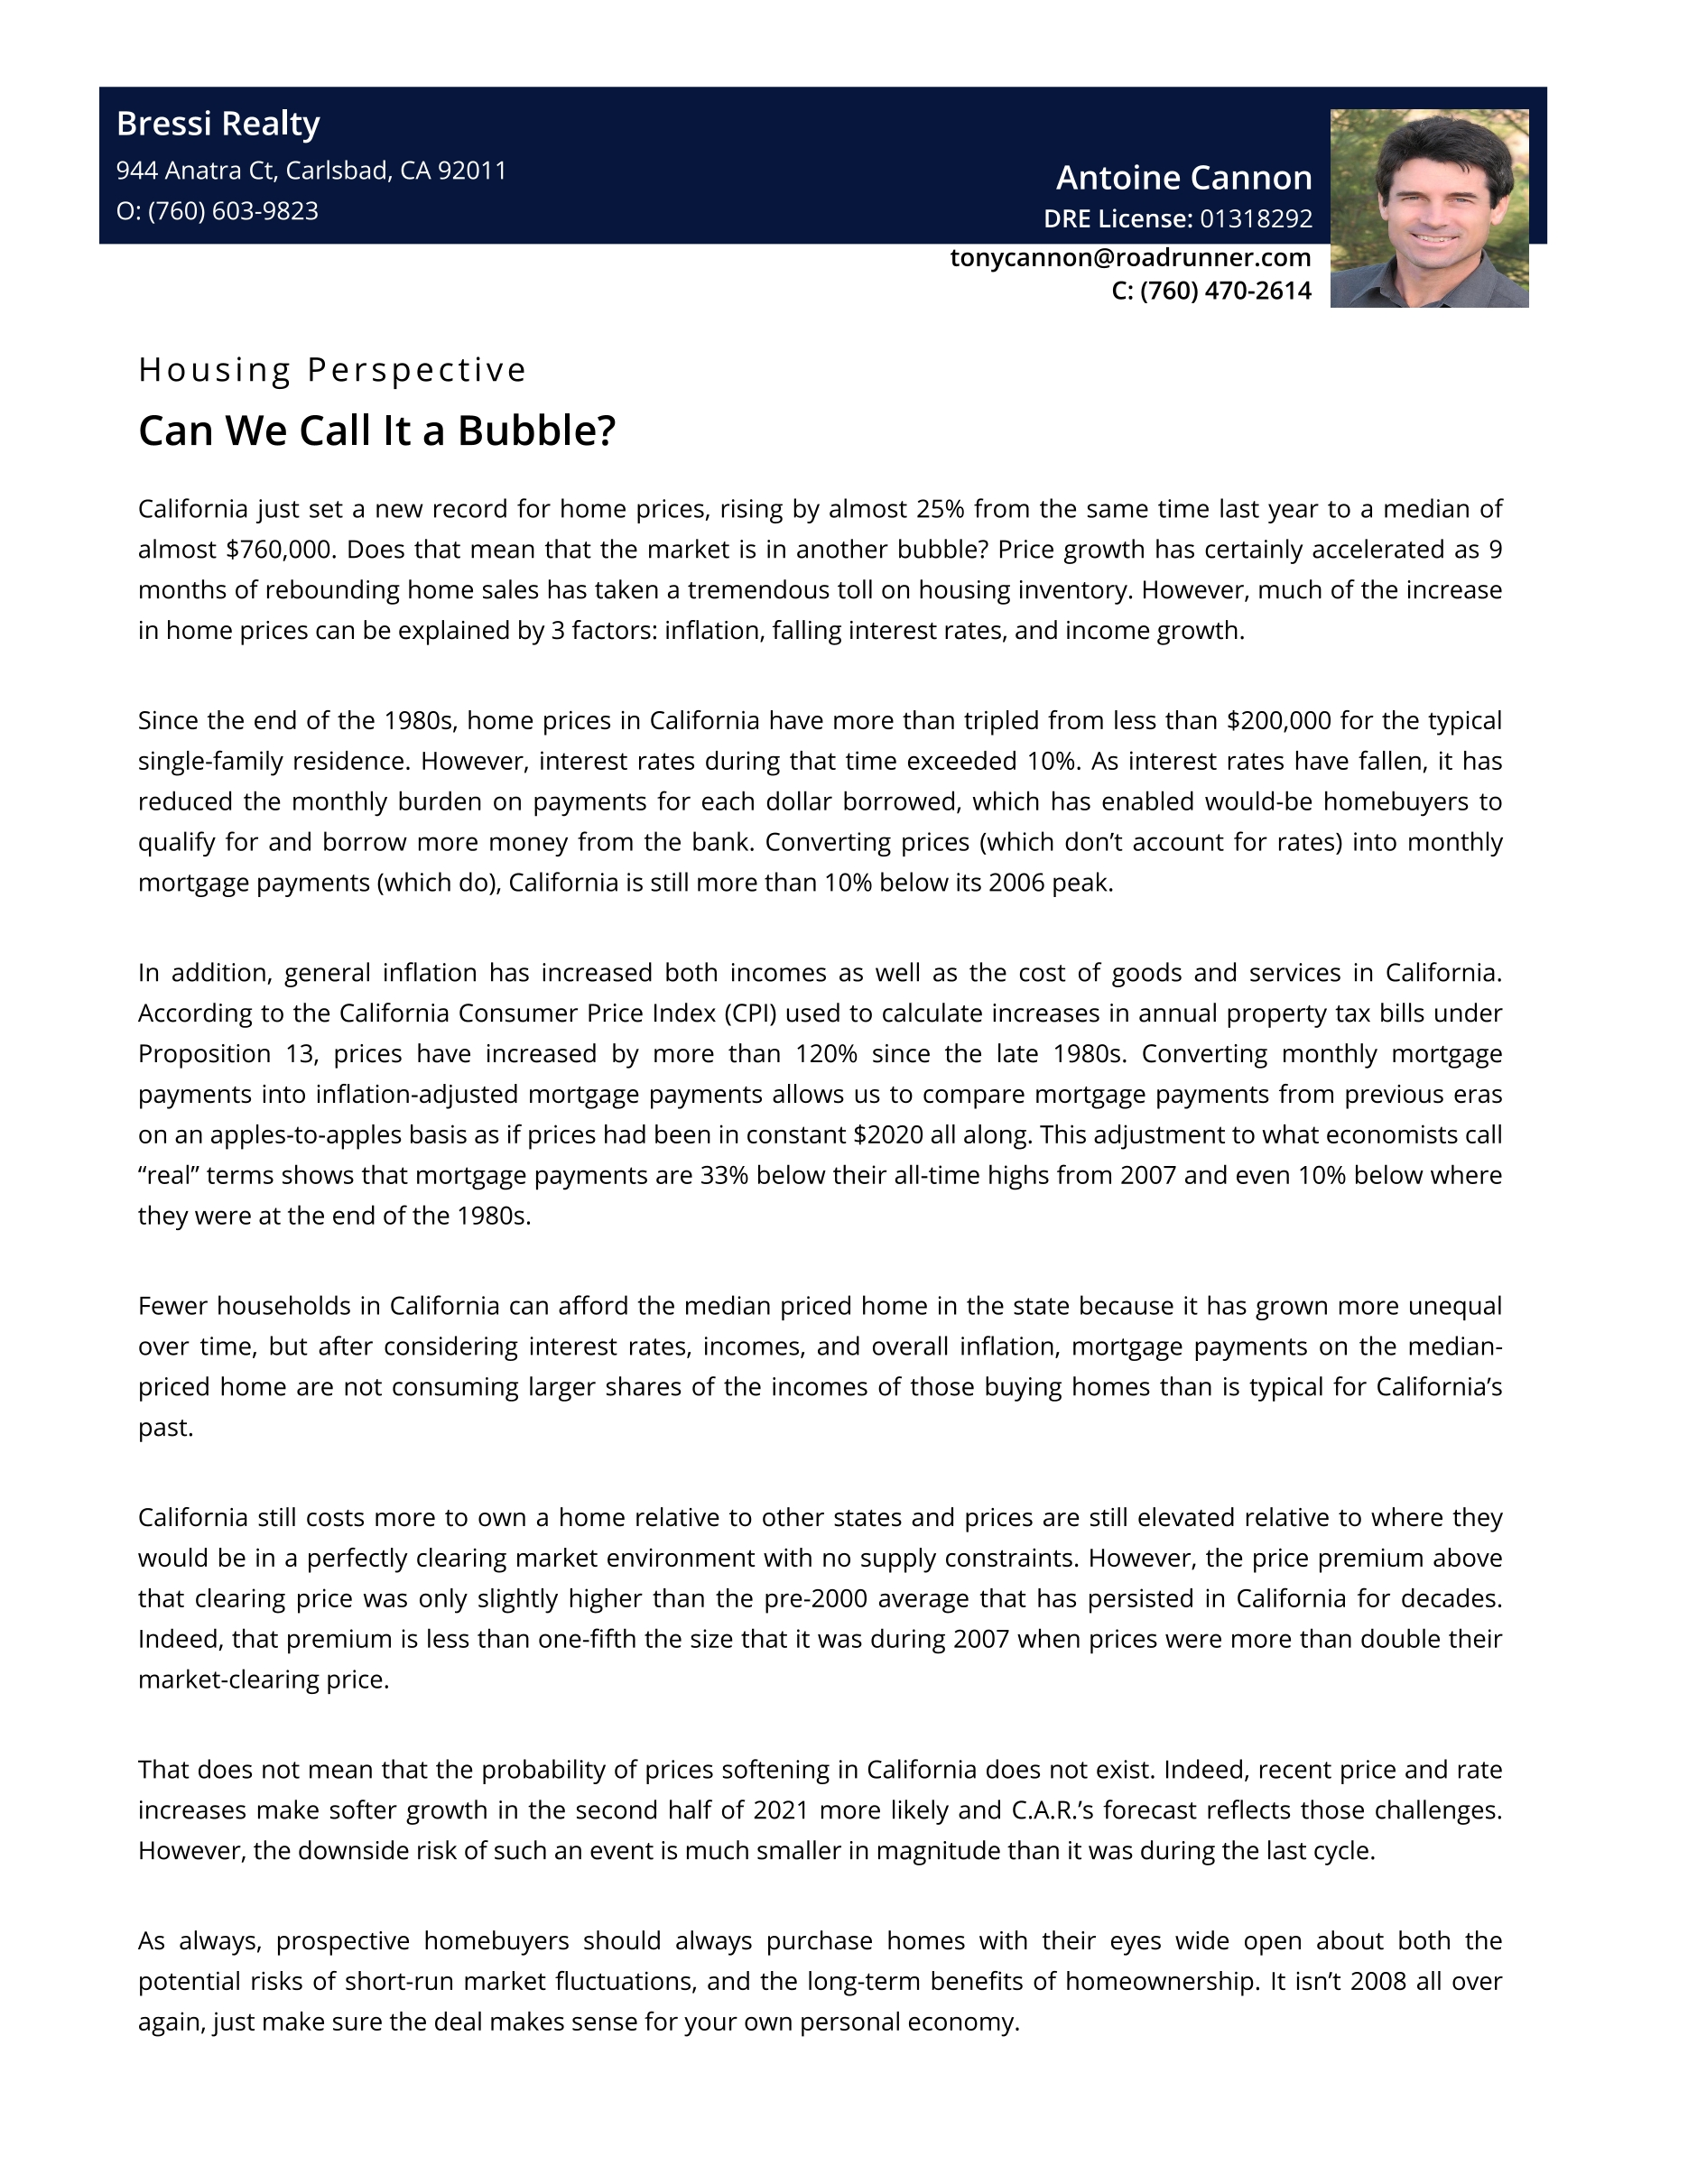 Housing Bubble Analysis 2021